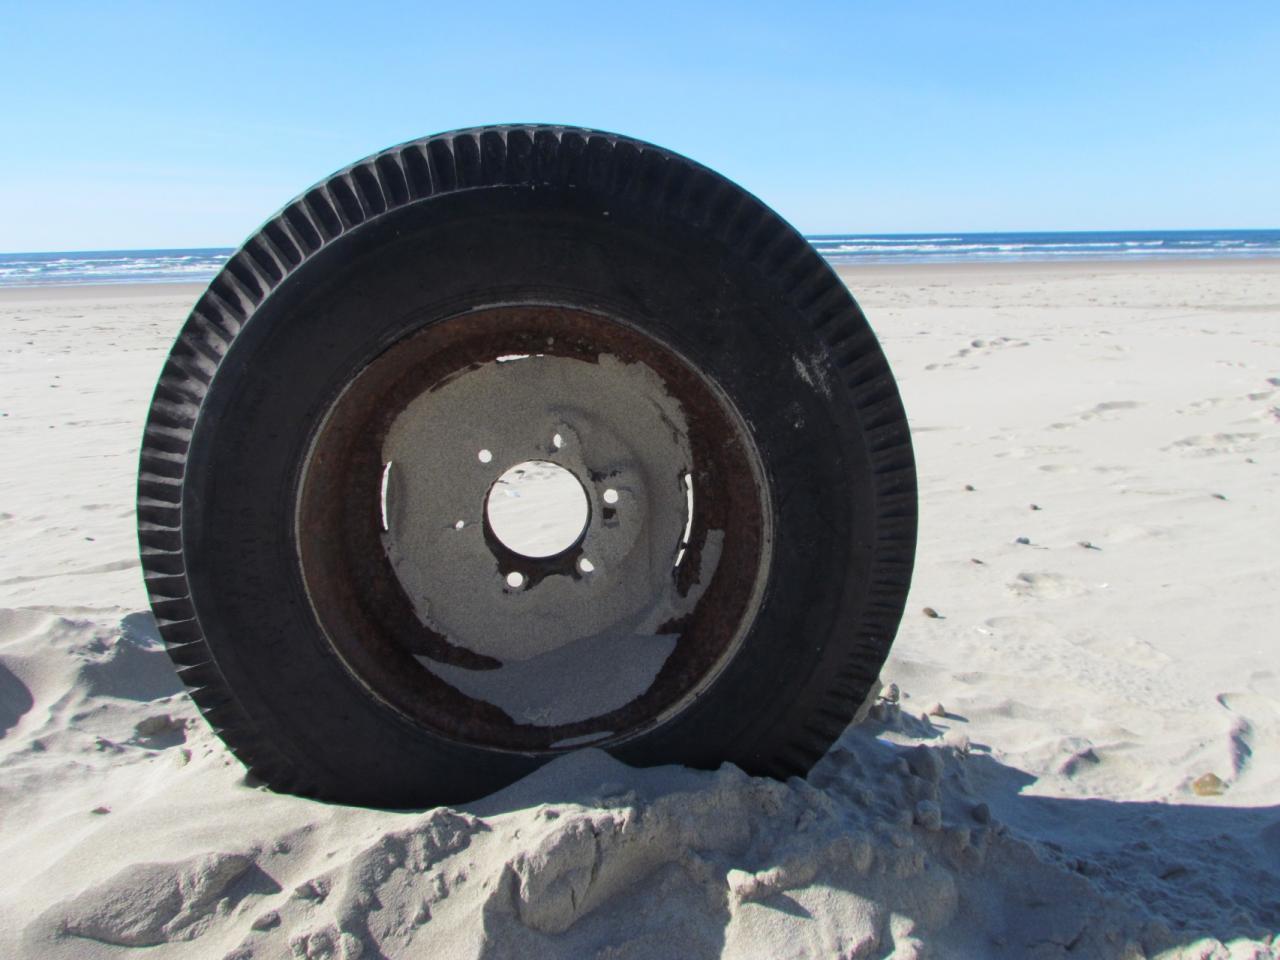 Photo of tire found on beach.